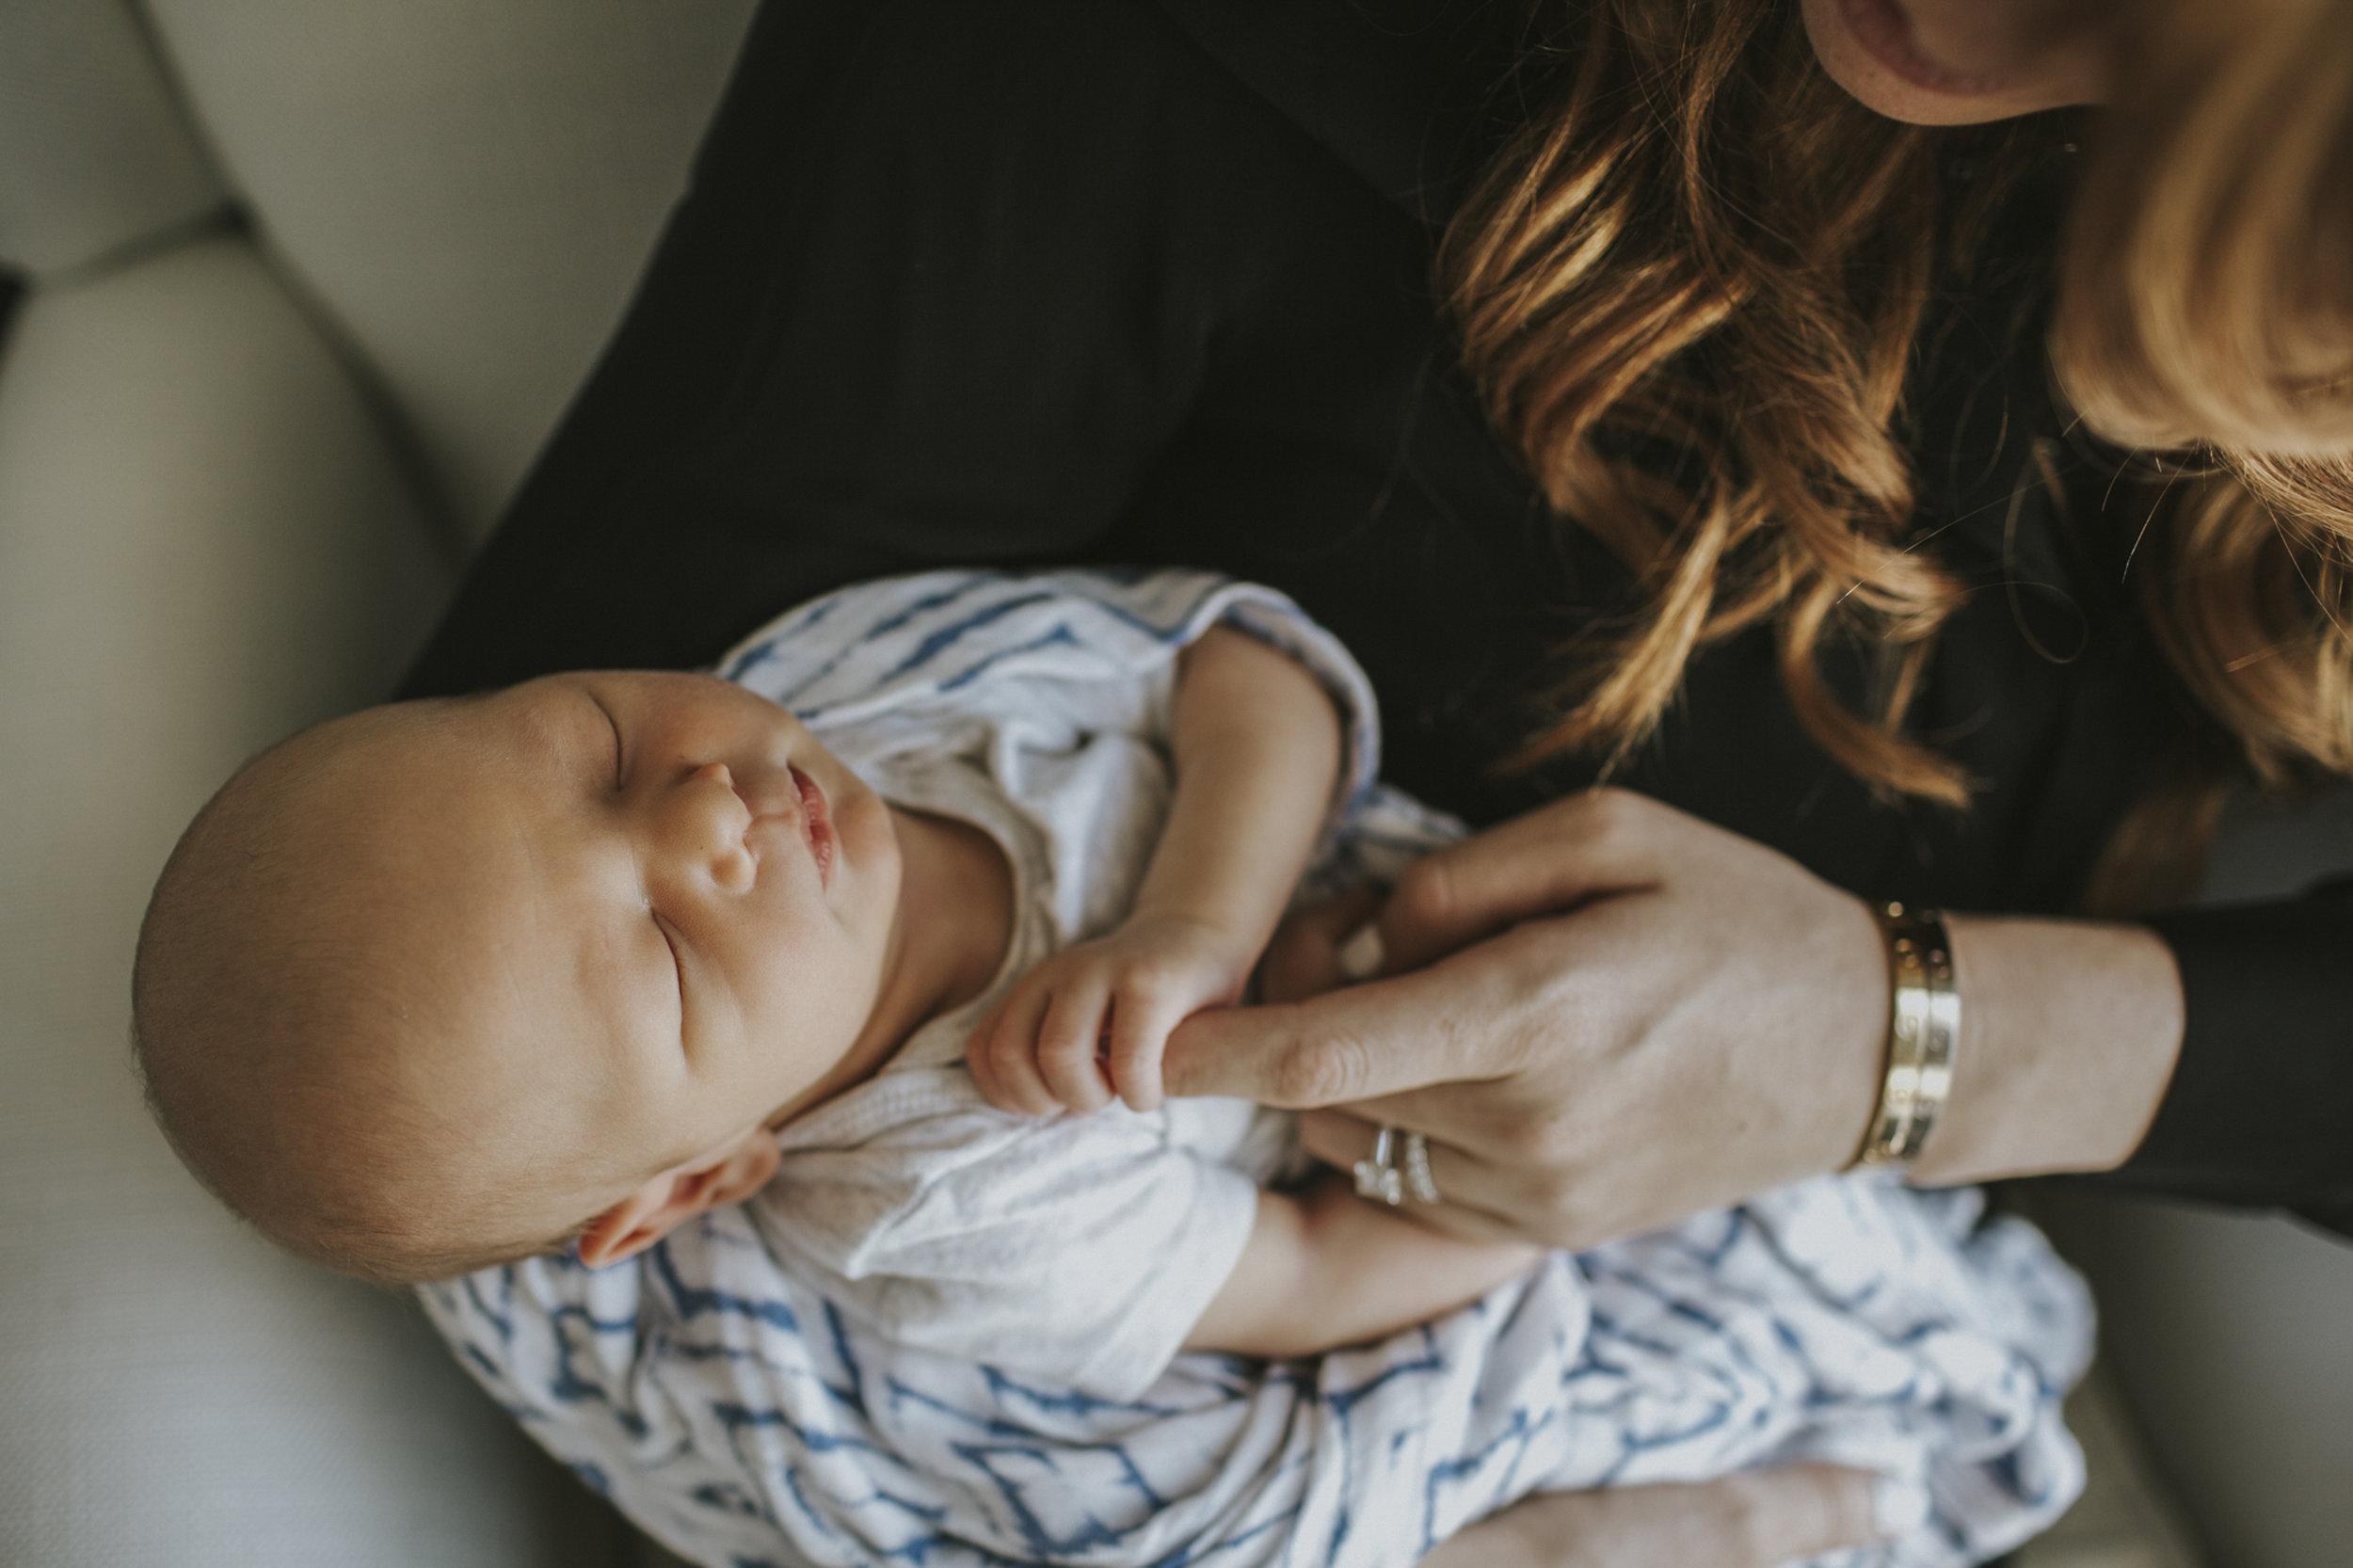 sheridan_nilsson_birth_sydney_newborn_photographer_northern_beaches-6.JPG